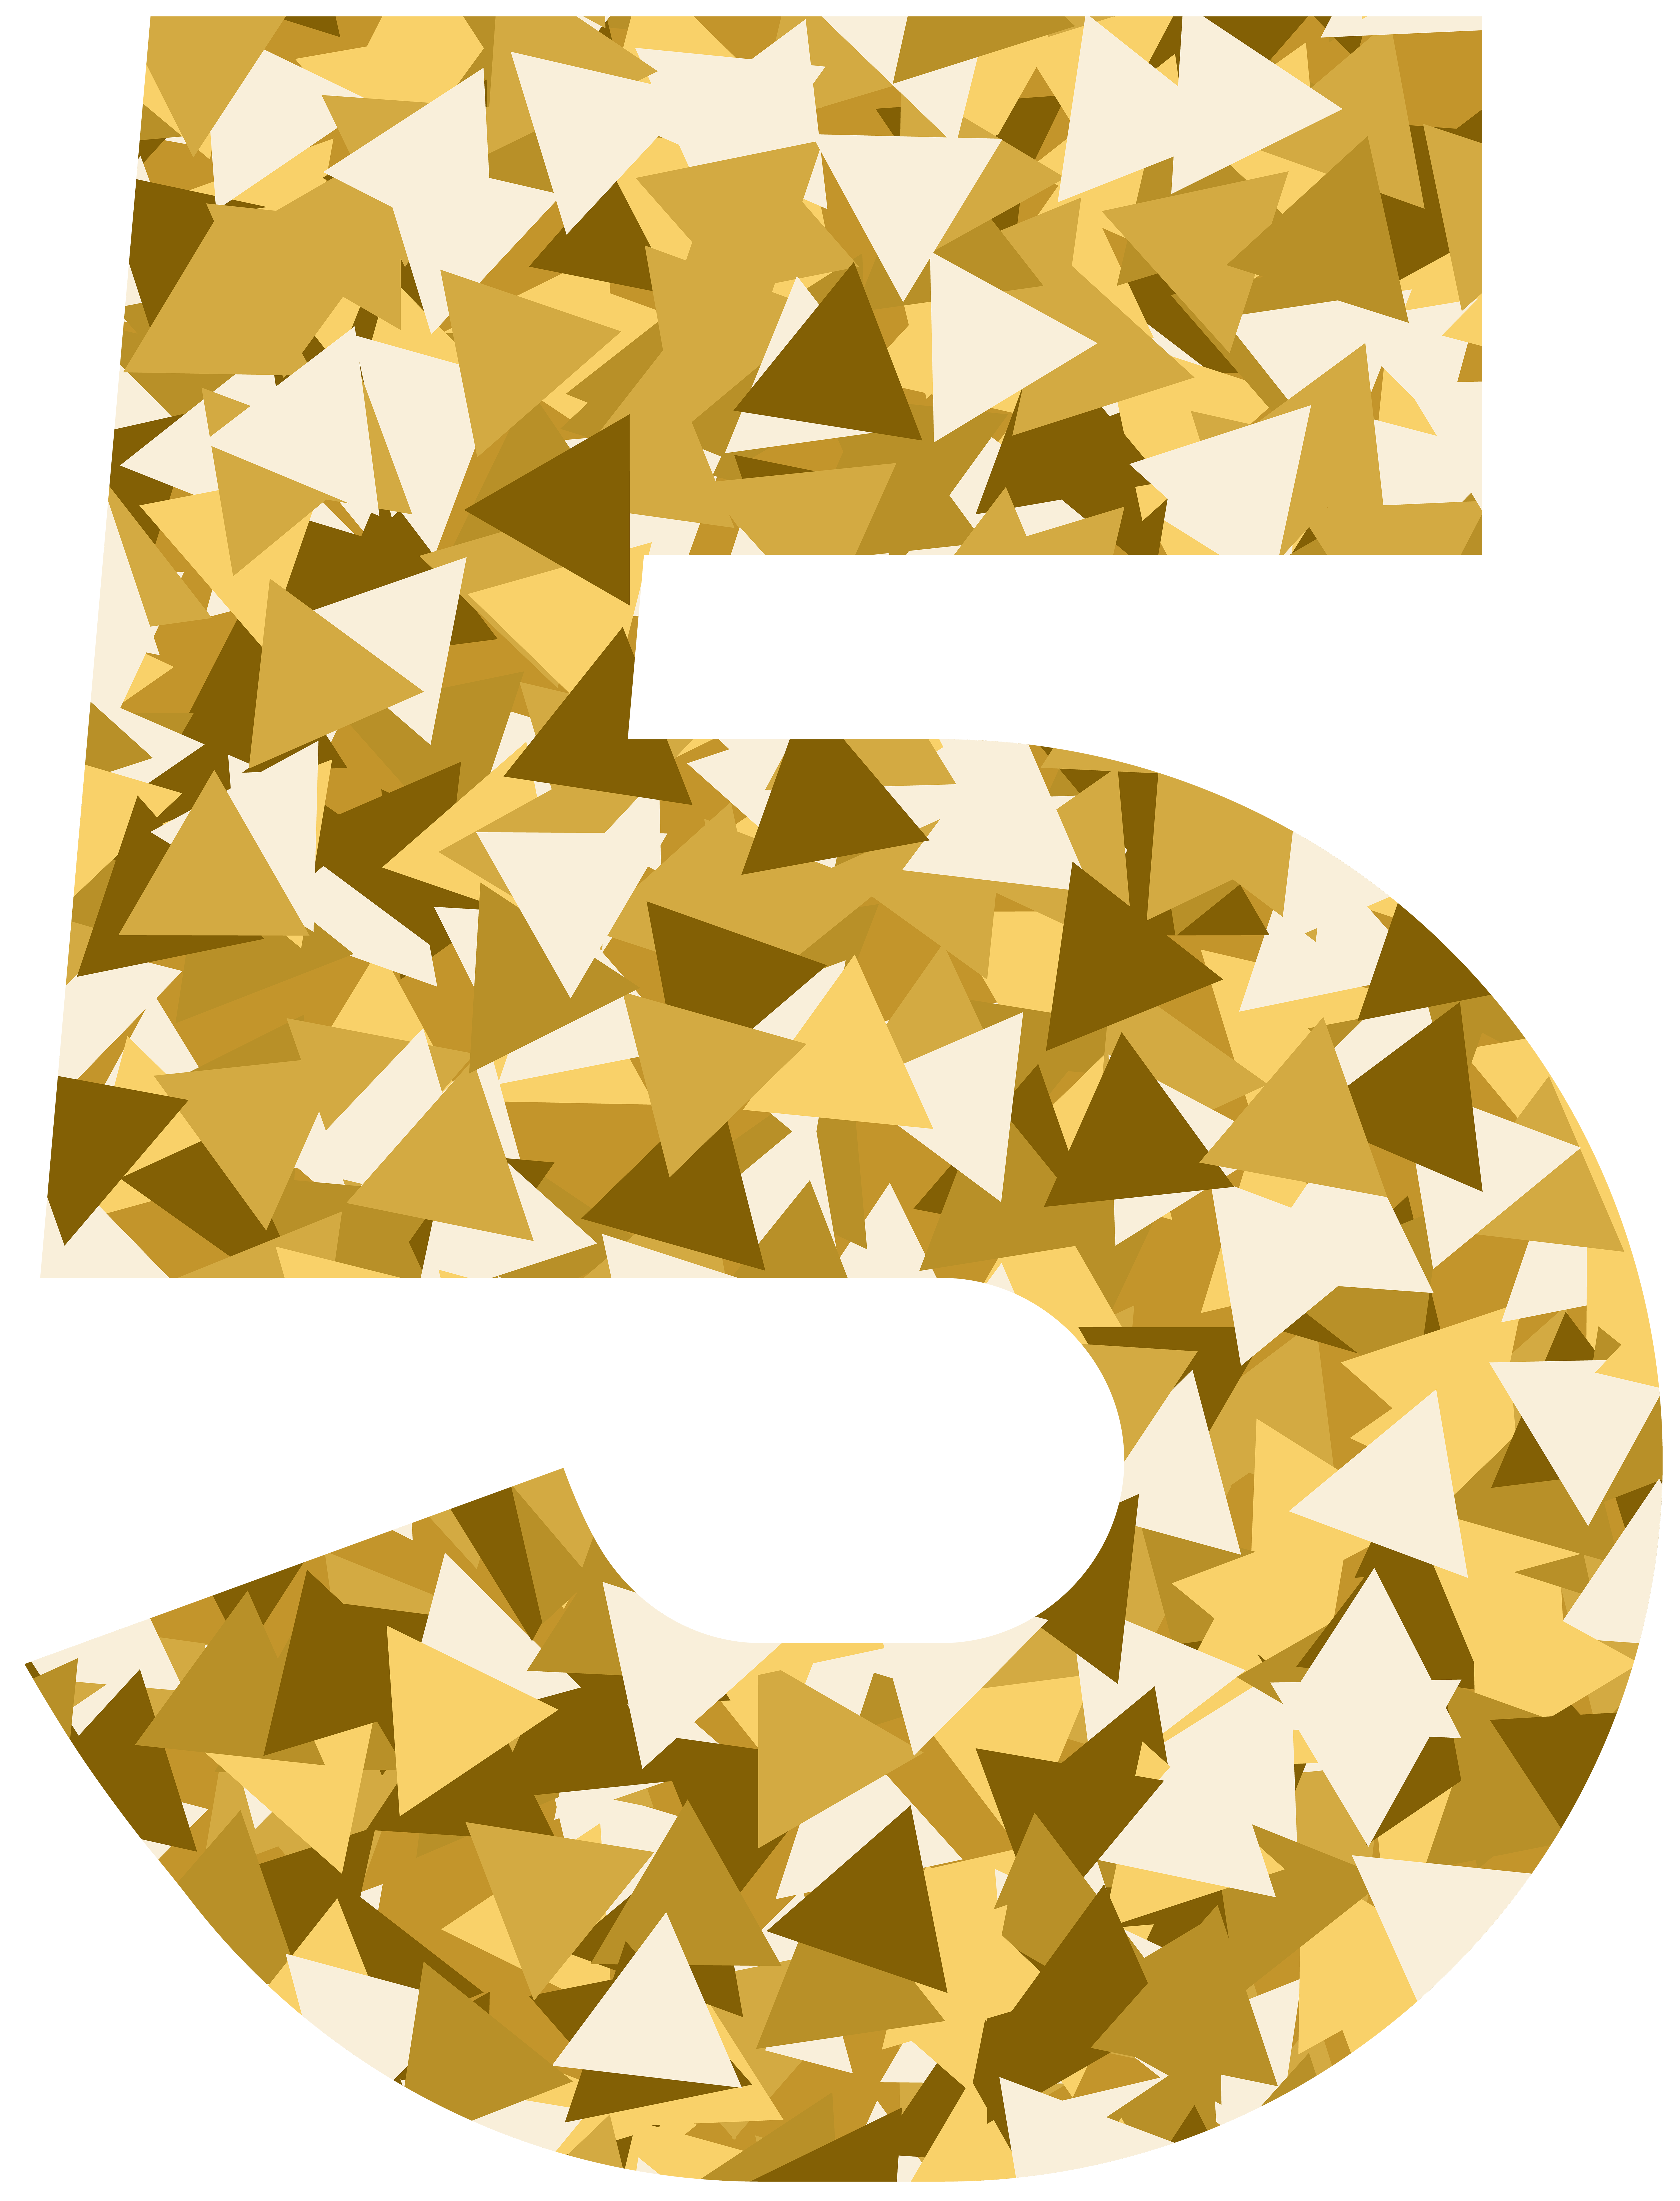 Triangular clipart geometric shape. Geometry clip art mosaic